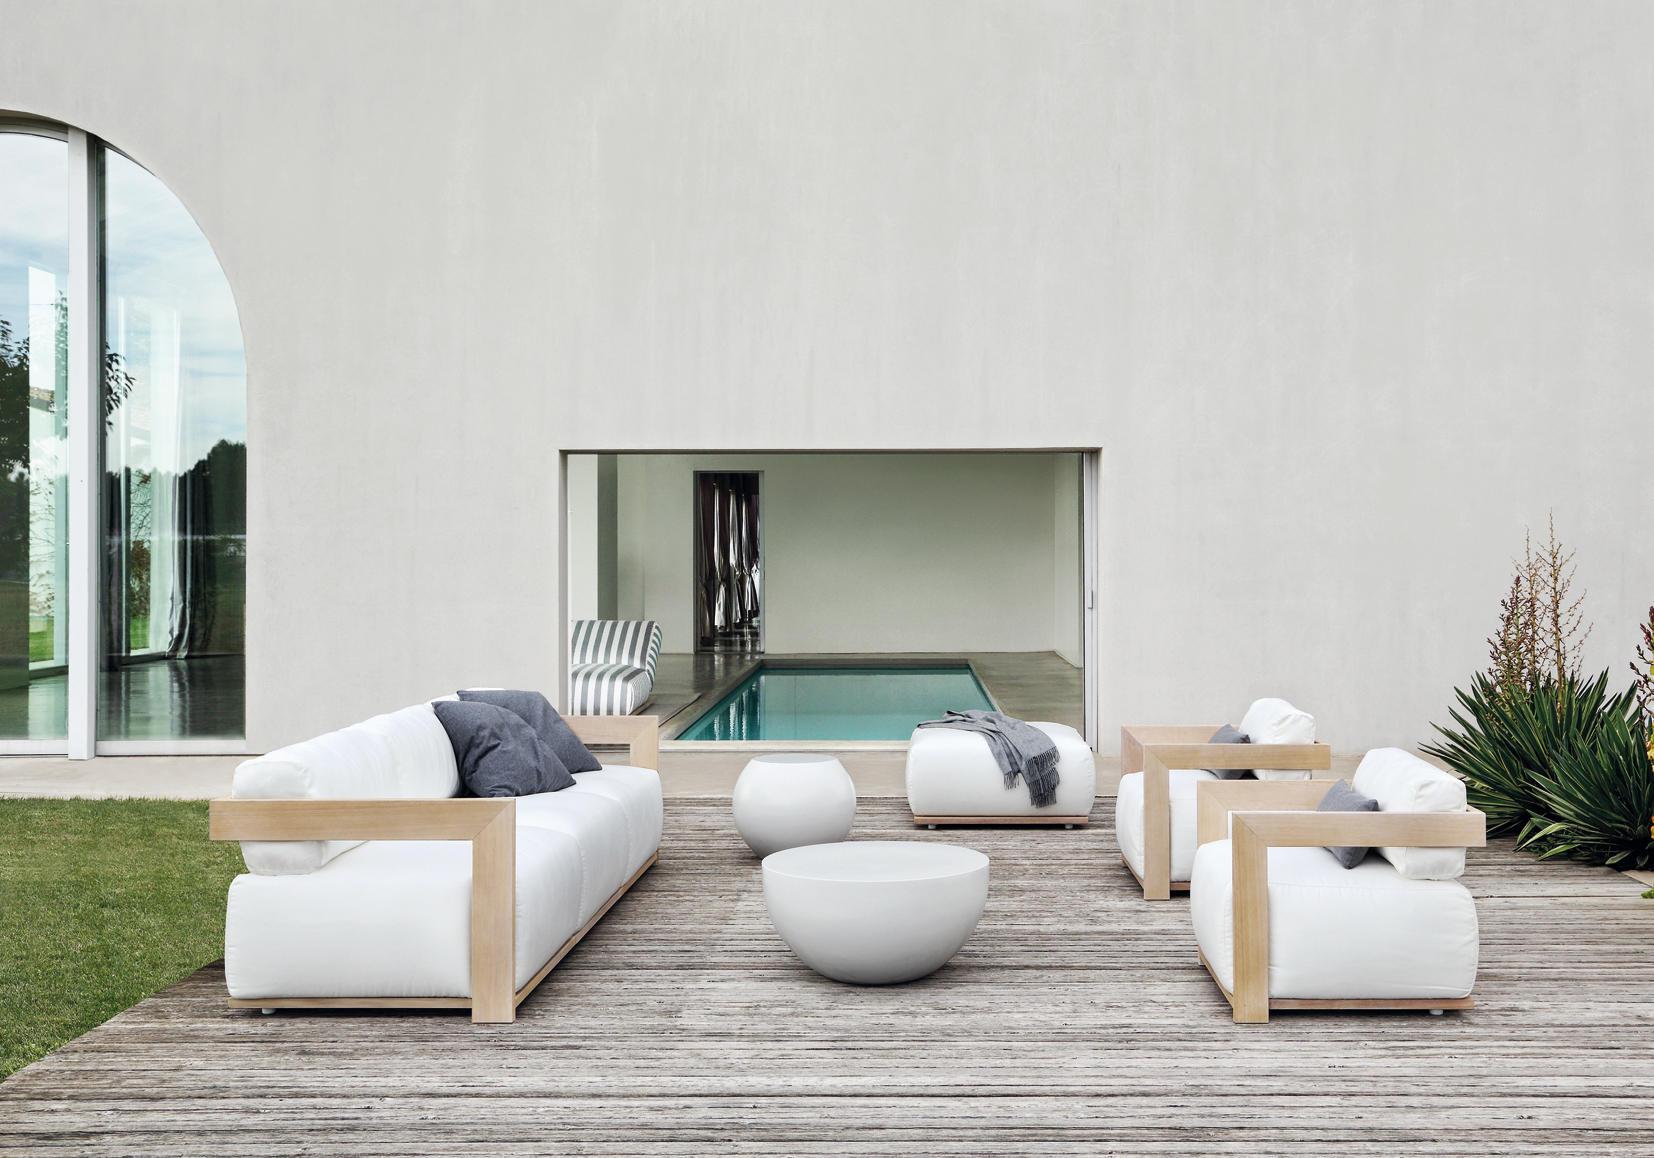 Waterproof Garden Cushions